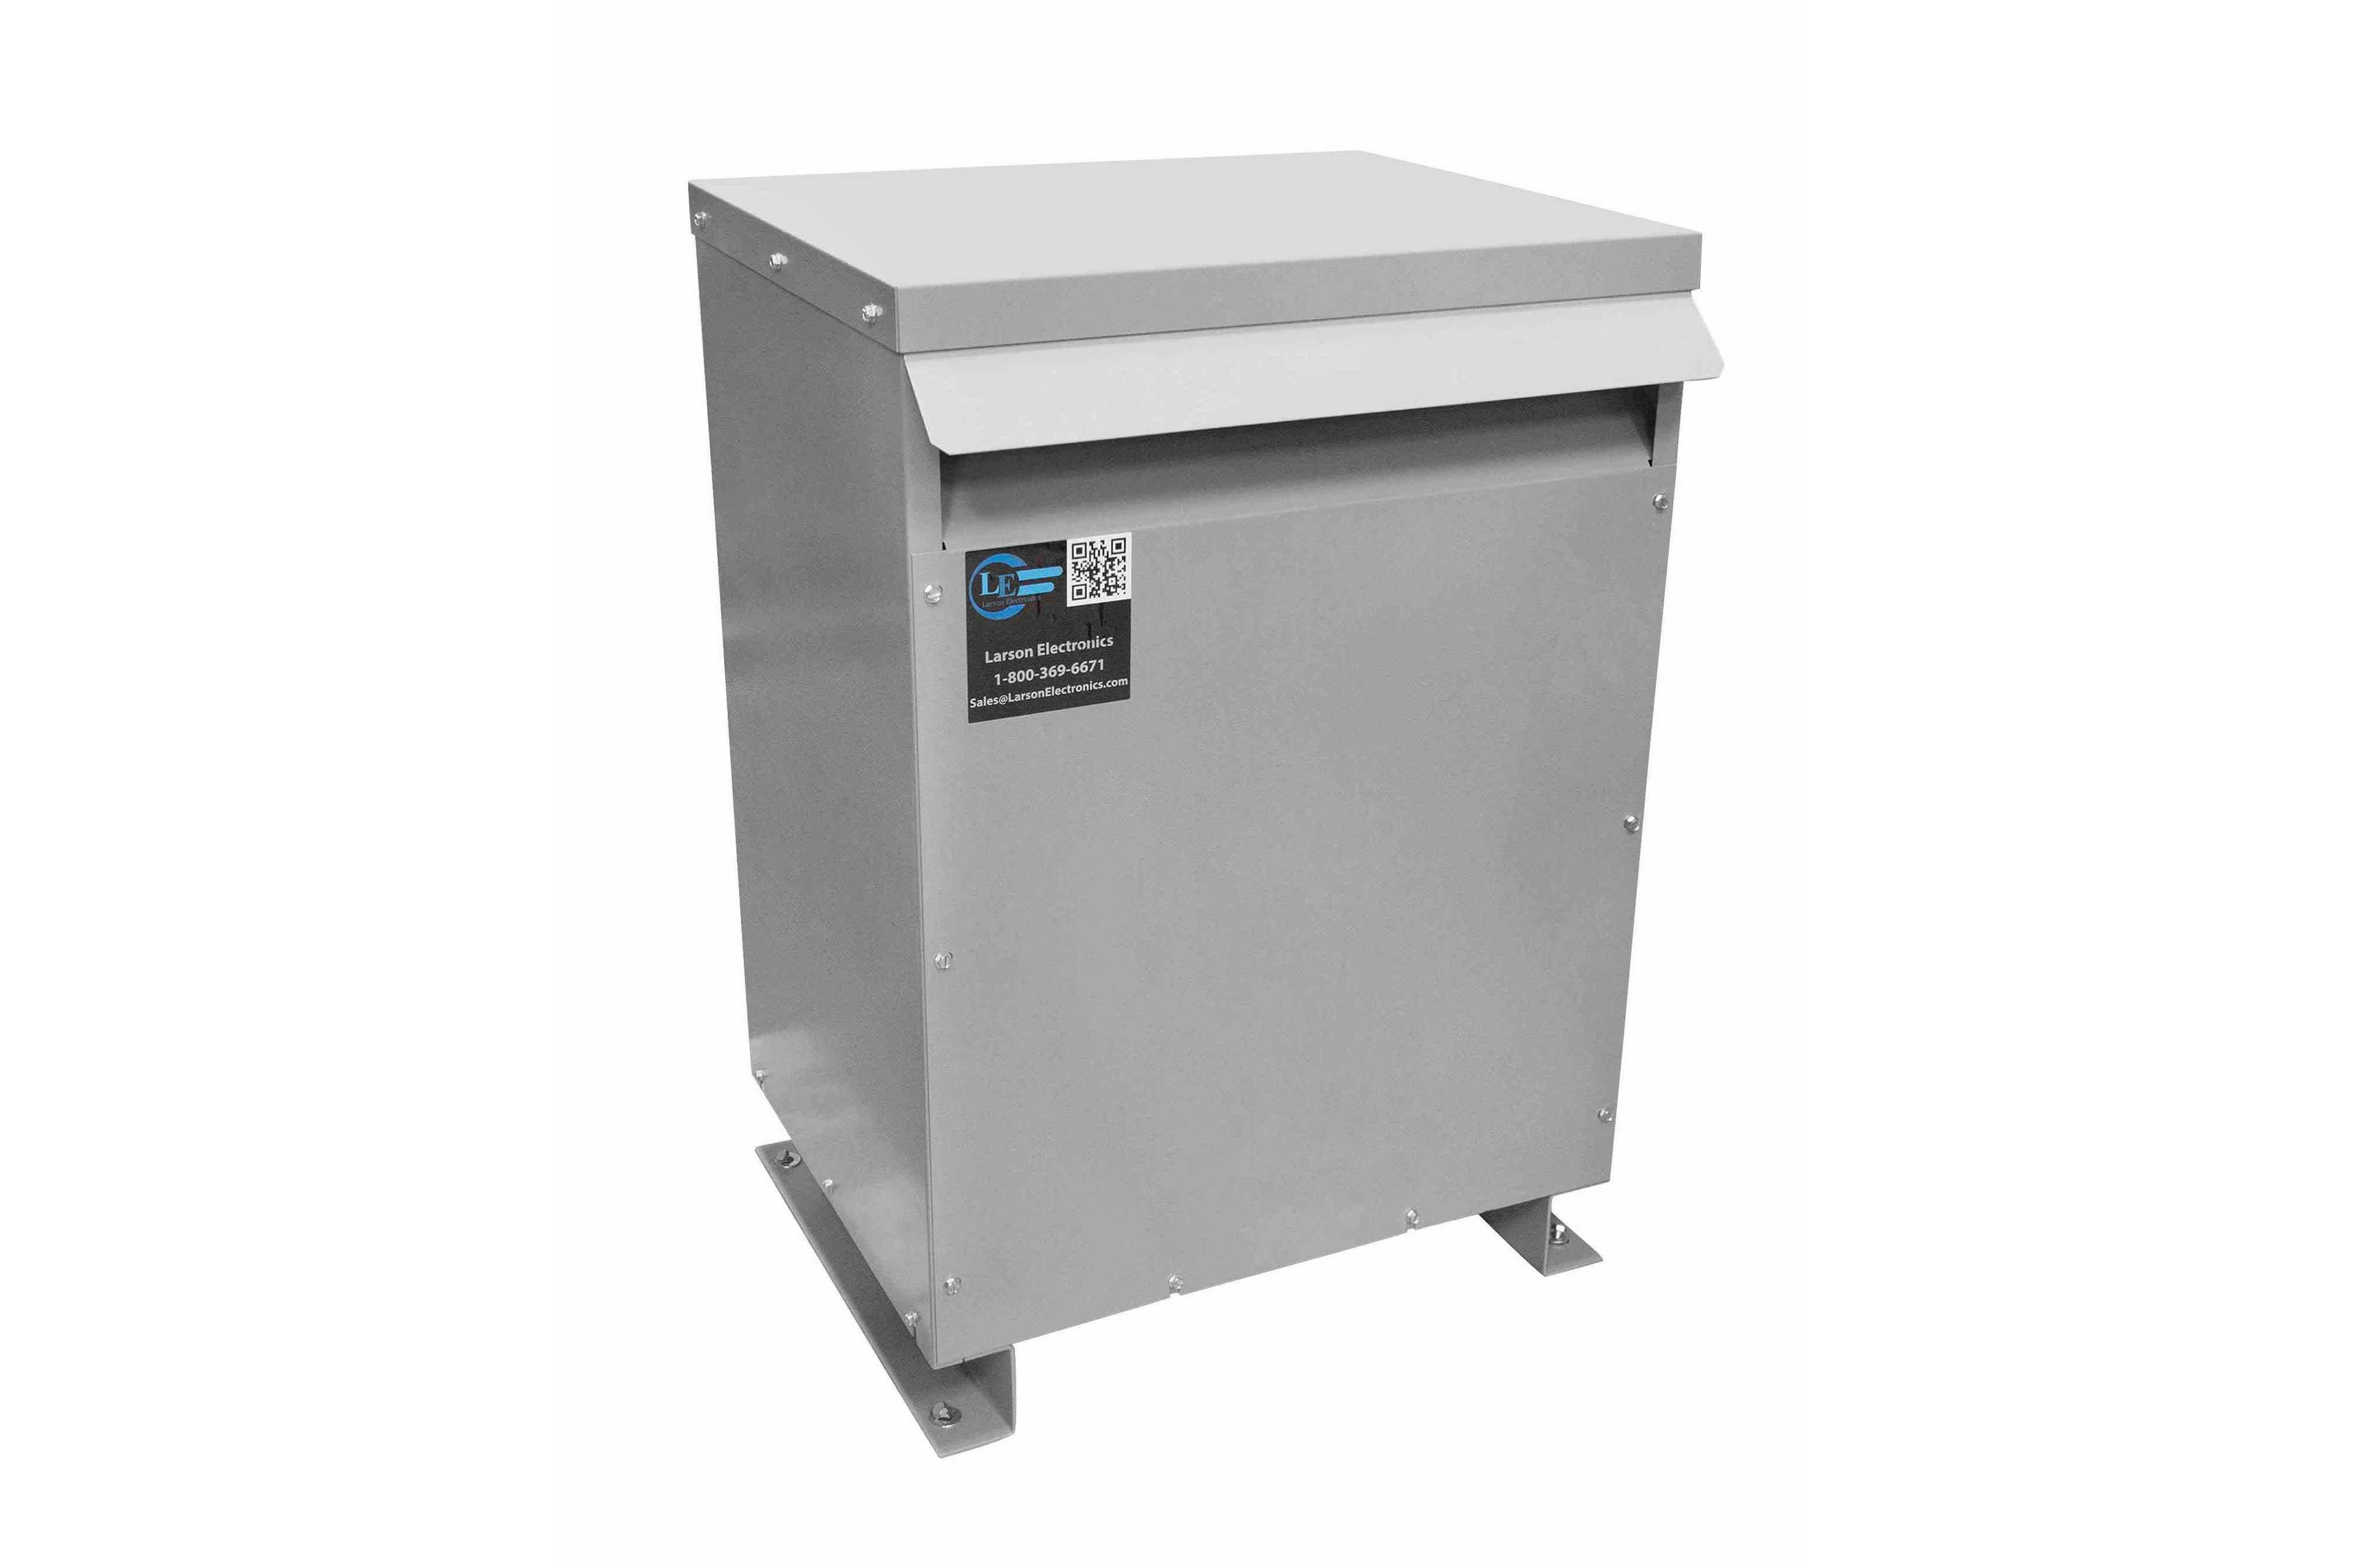 1000 kVA 3PH Isolation Transformer, 480V Wye Primary, 380Y/220 Wye-N Secondary, N3R, Ventilated, 60 Hz